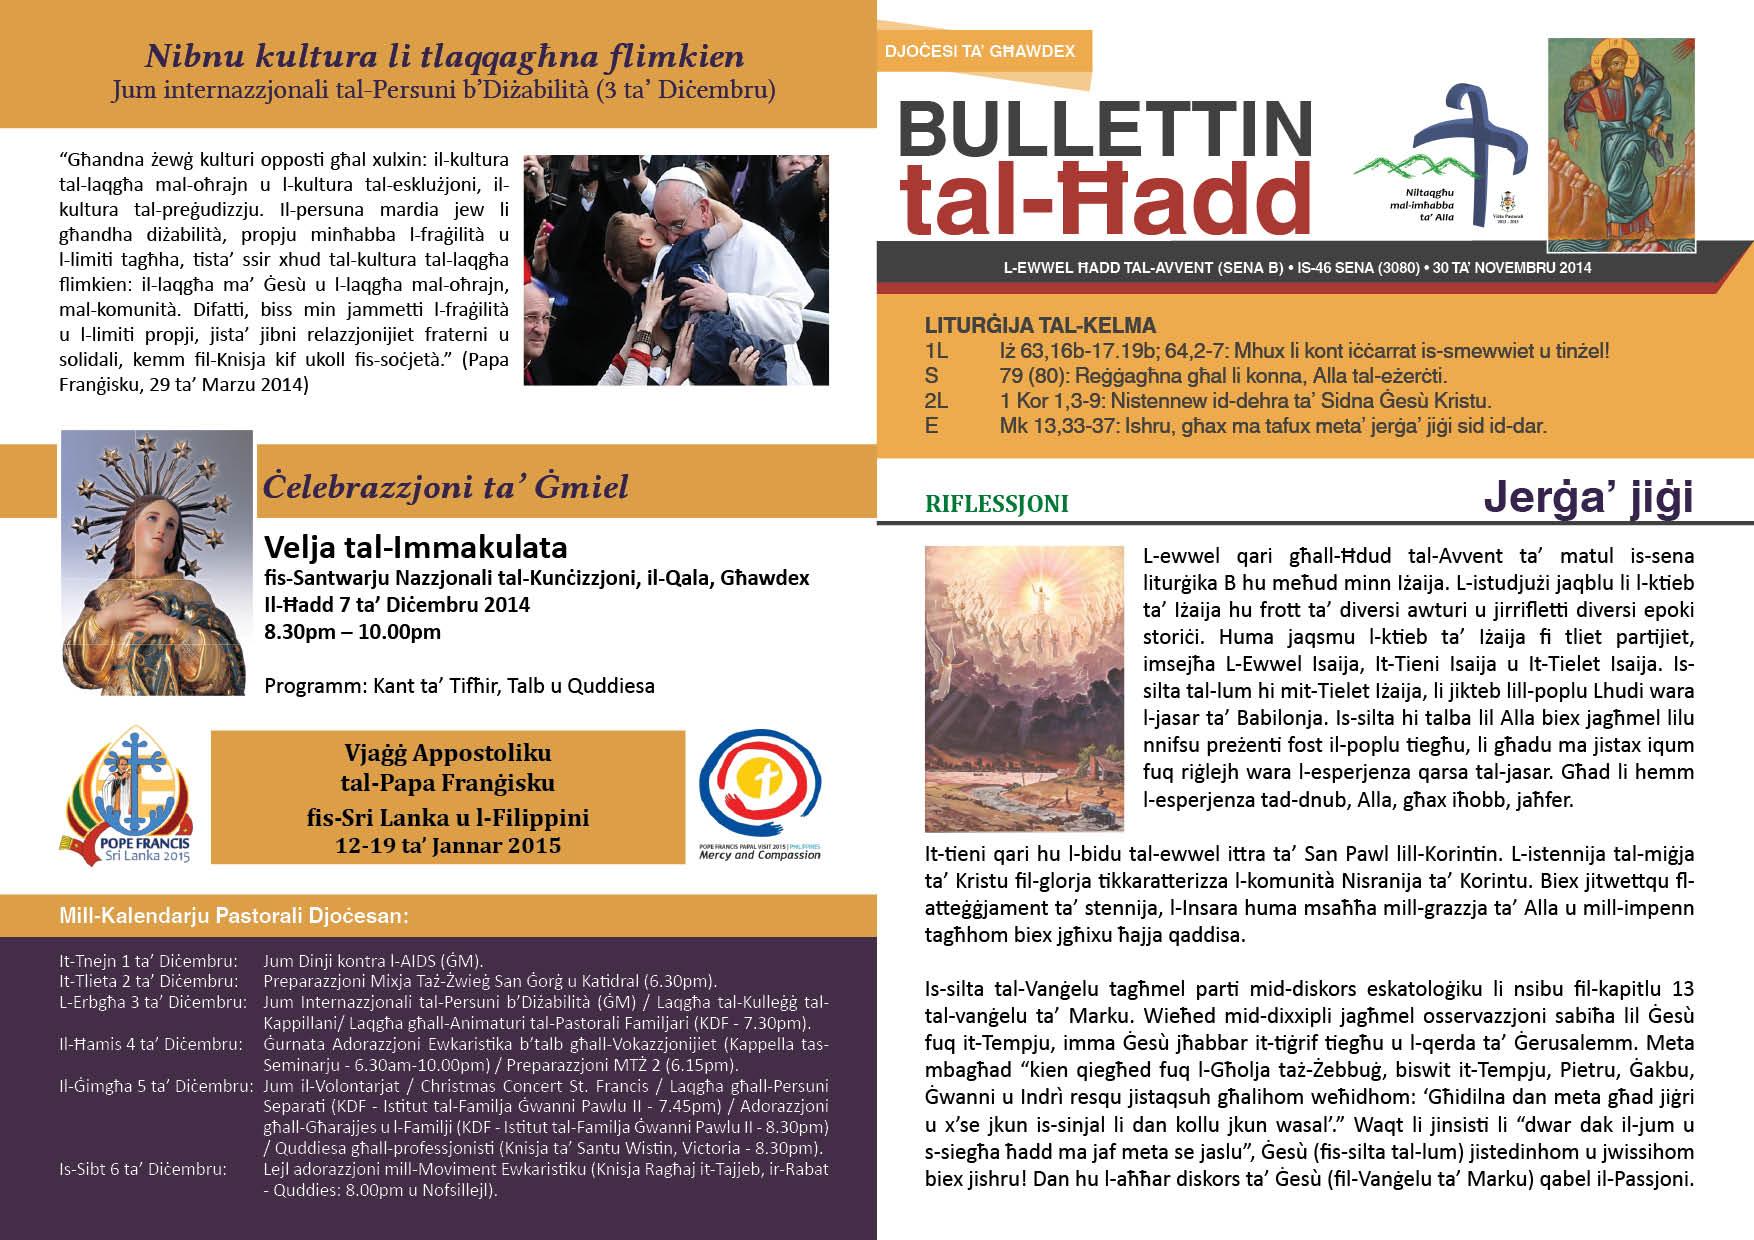 bullettin-2014-novembru-30.jpg